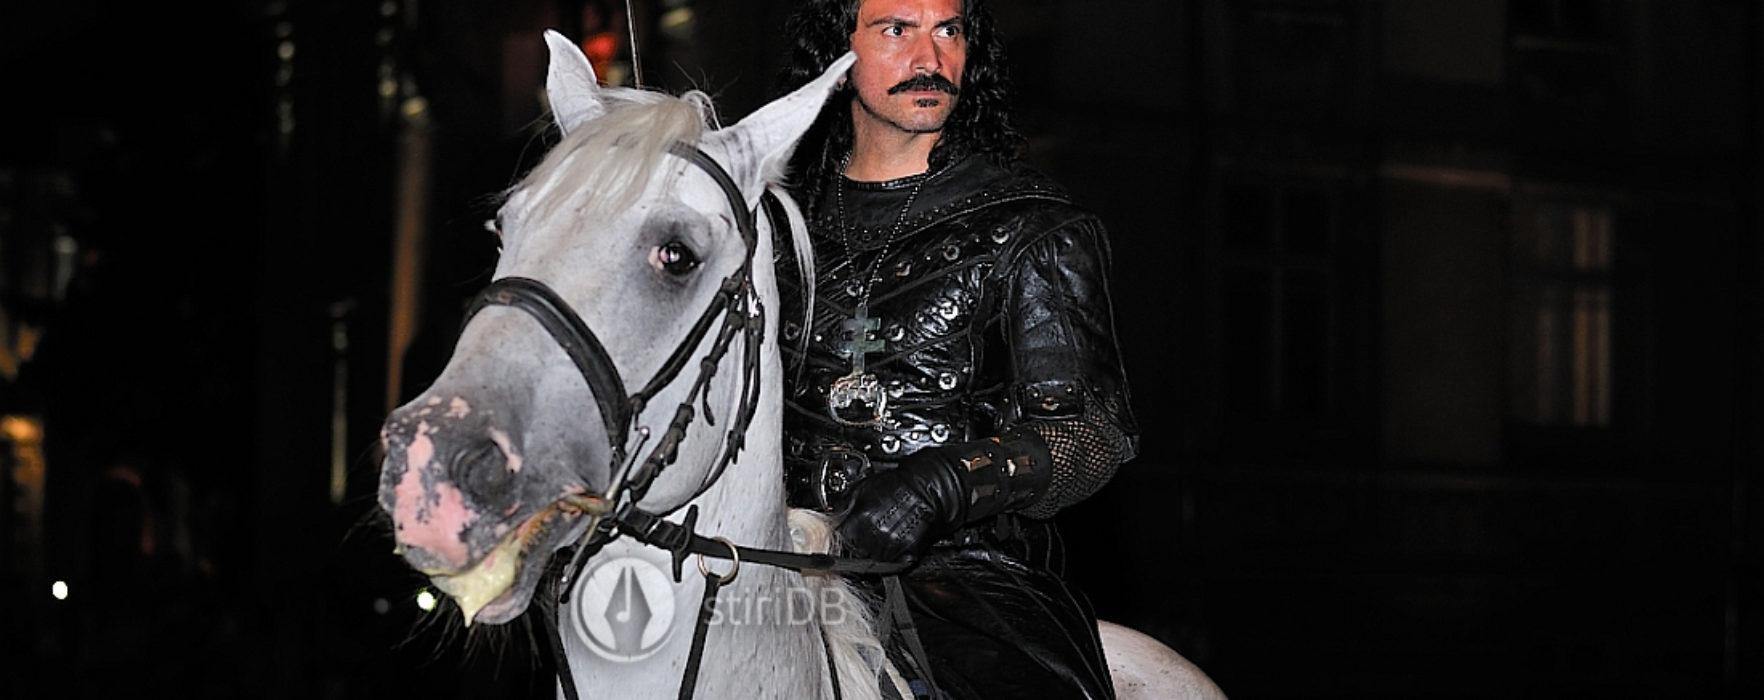 Festivalul Medieval Dracula, deschis oficial (foto, video)